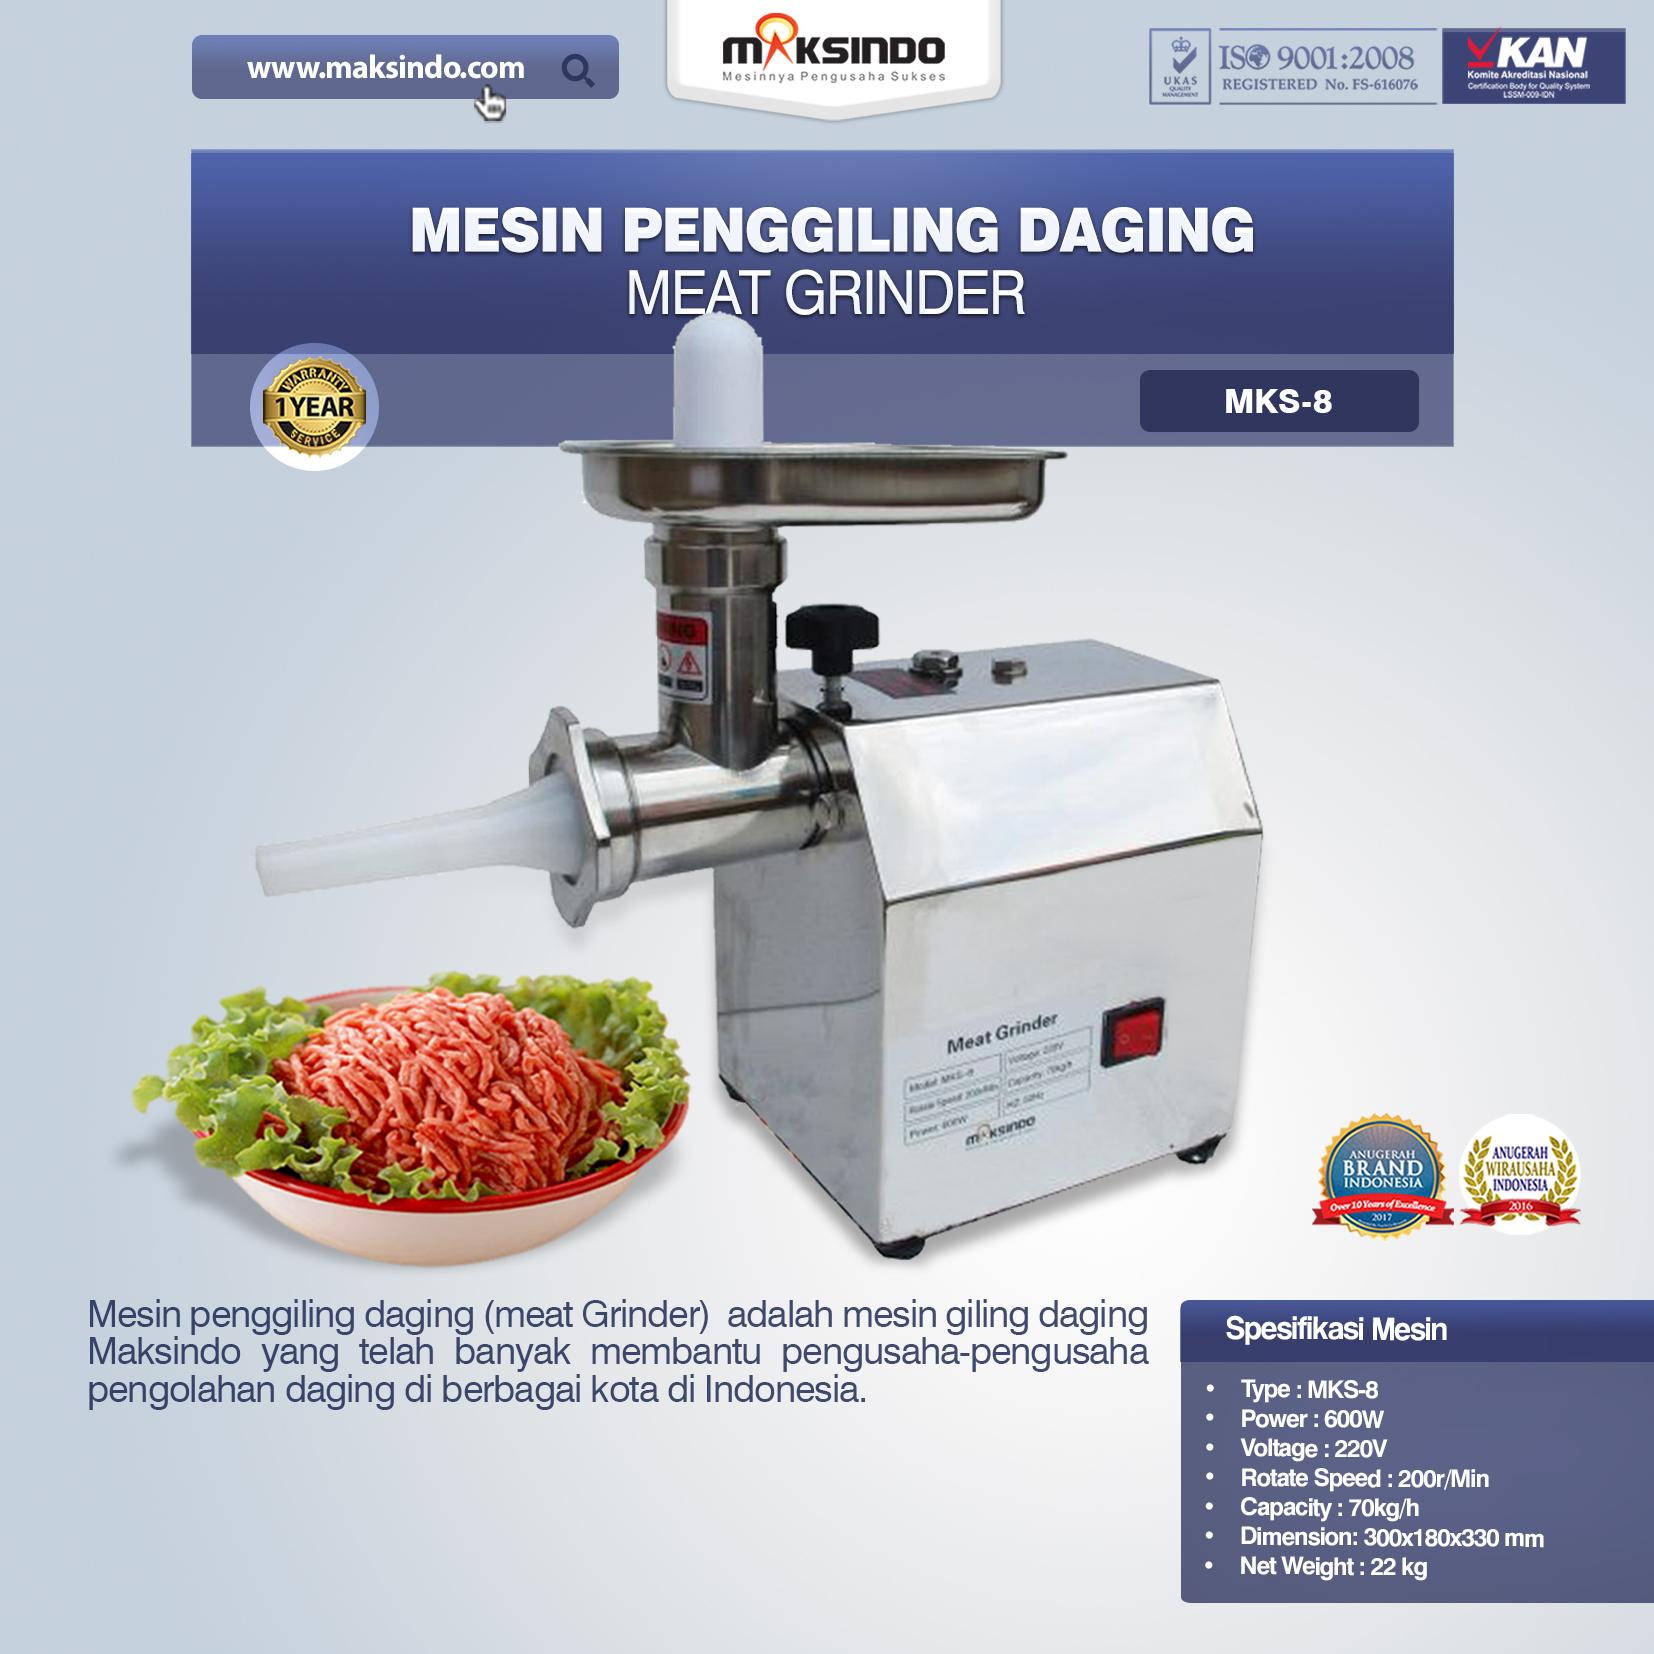 Mesin Penggiling Daging Meat Grinder MKS-8